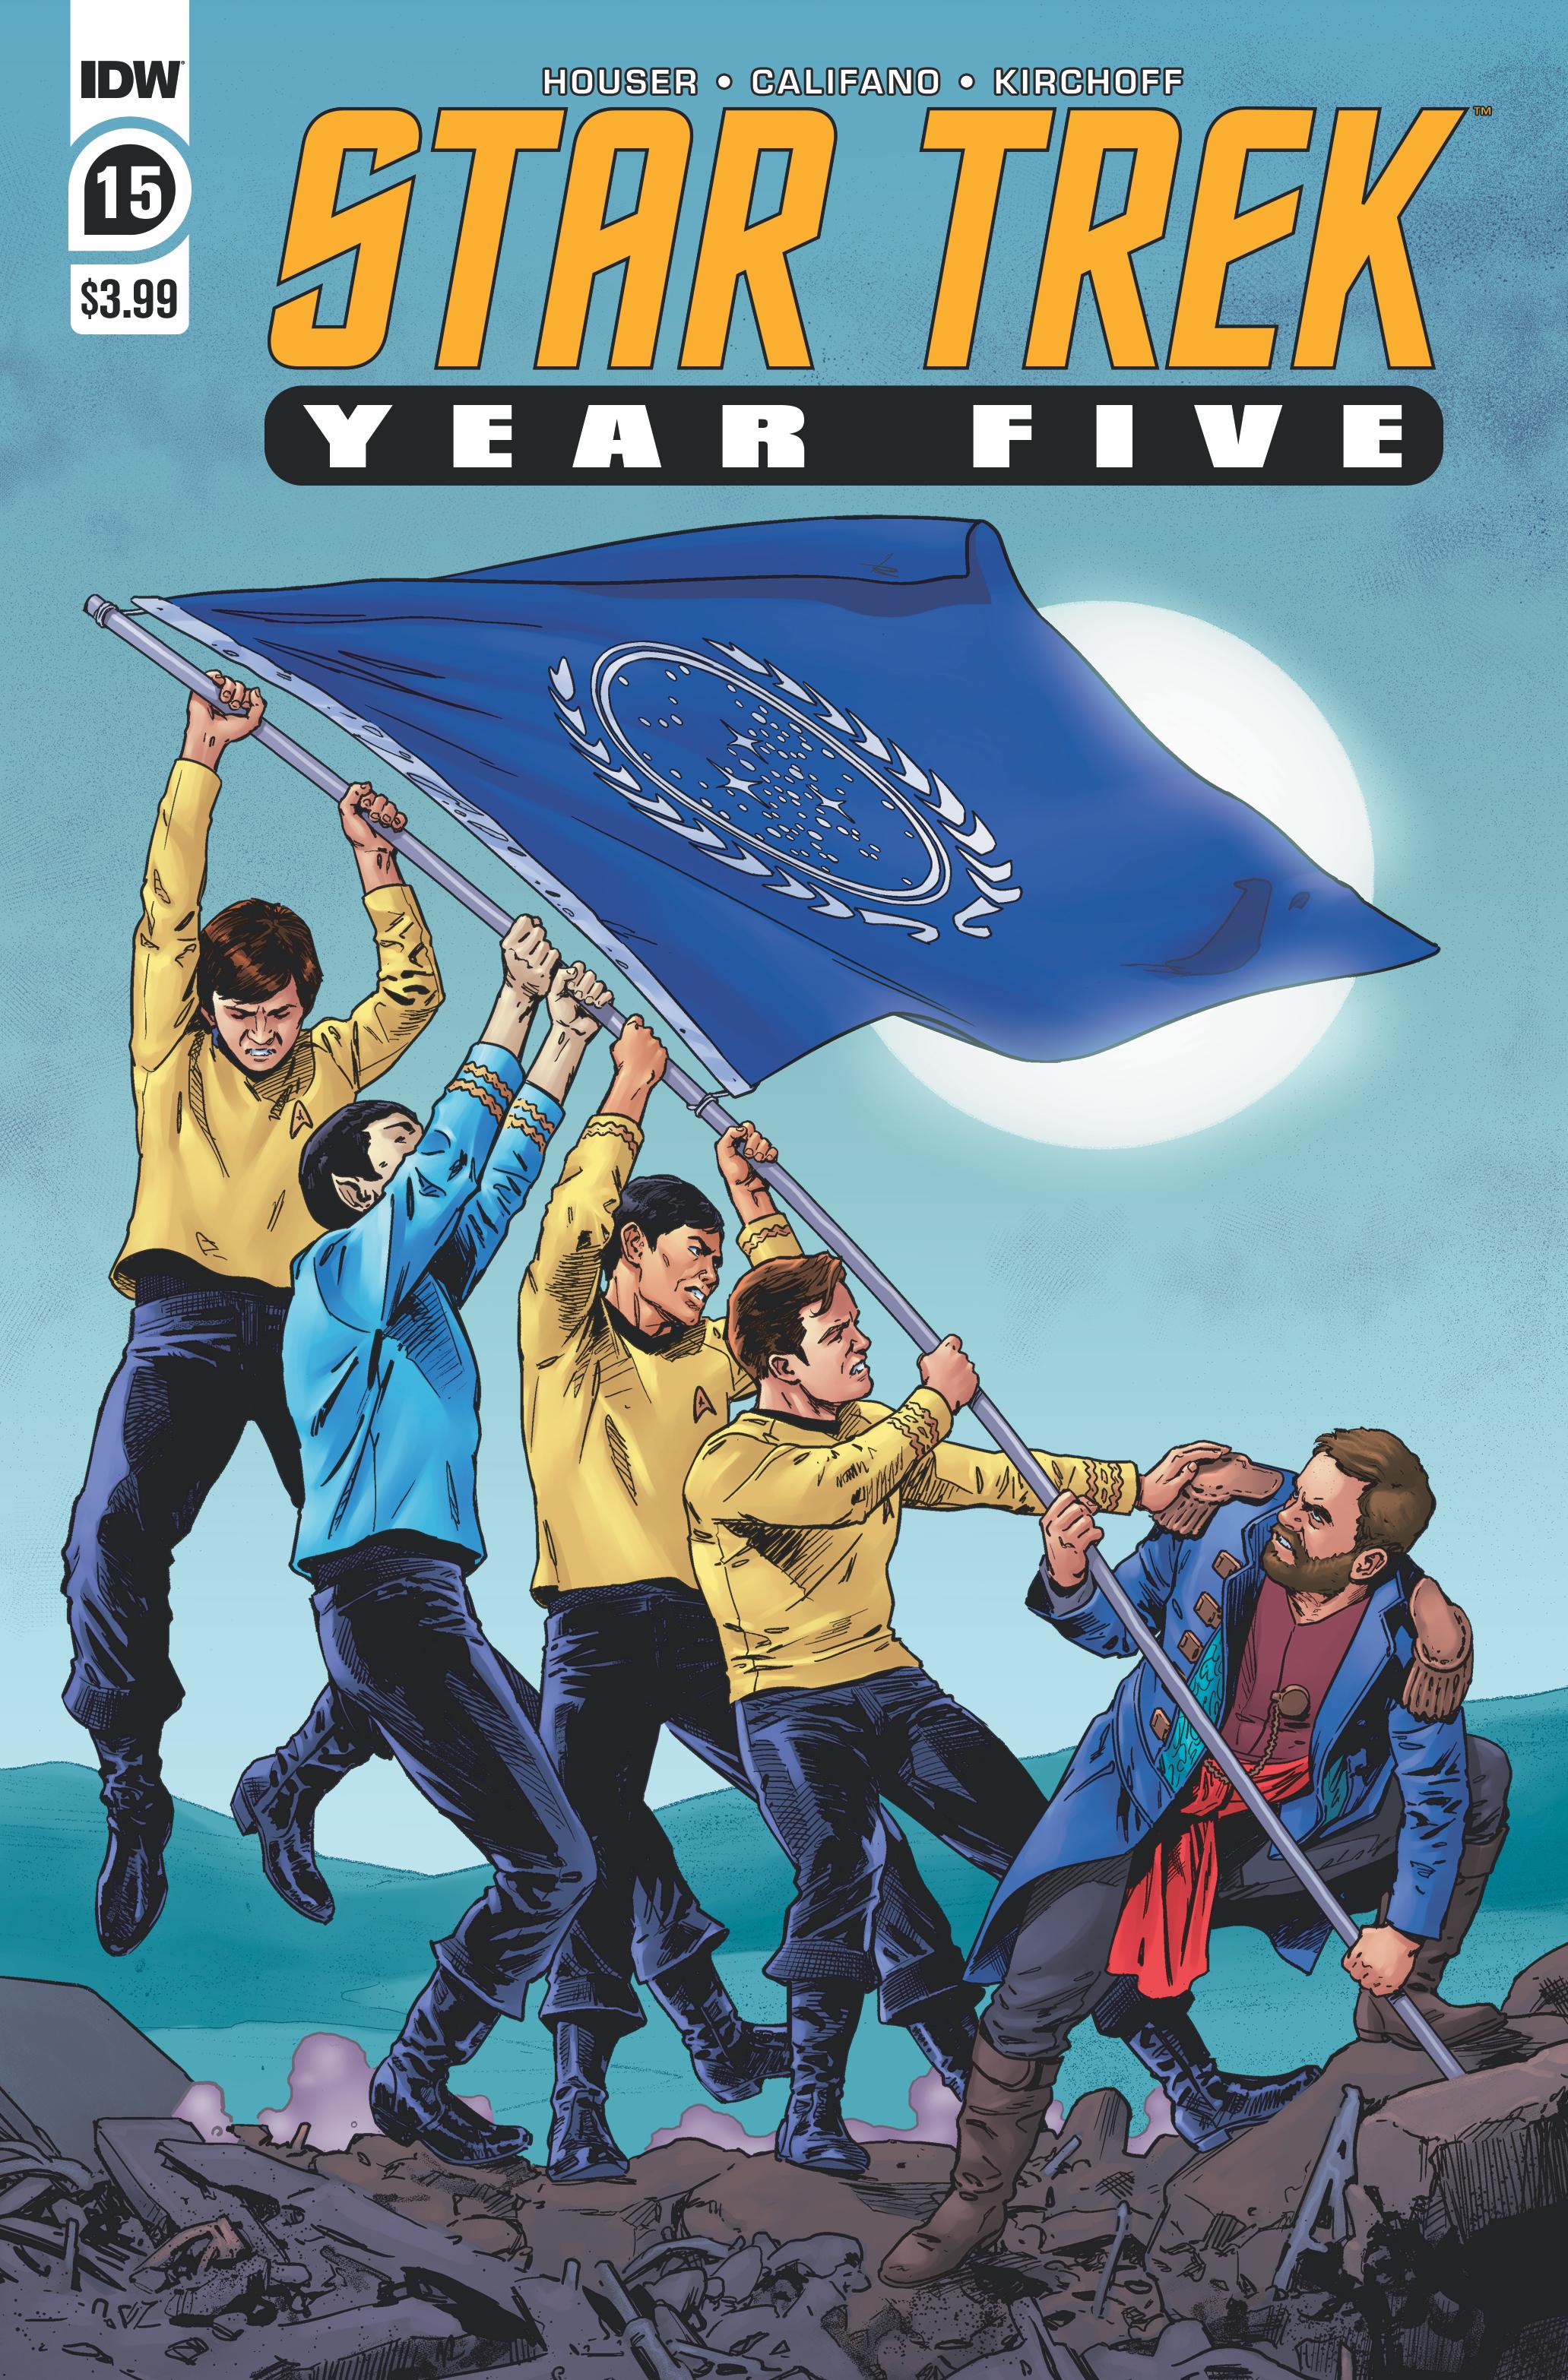 STAR TREK YEAR FIVE #15 CVR A THOMPSON